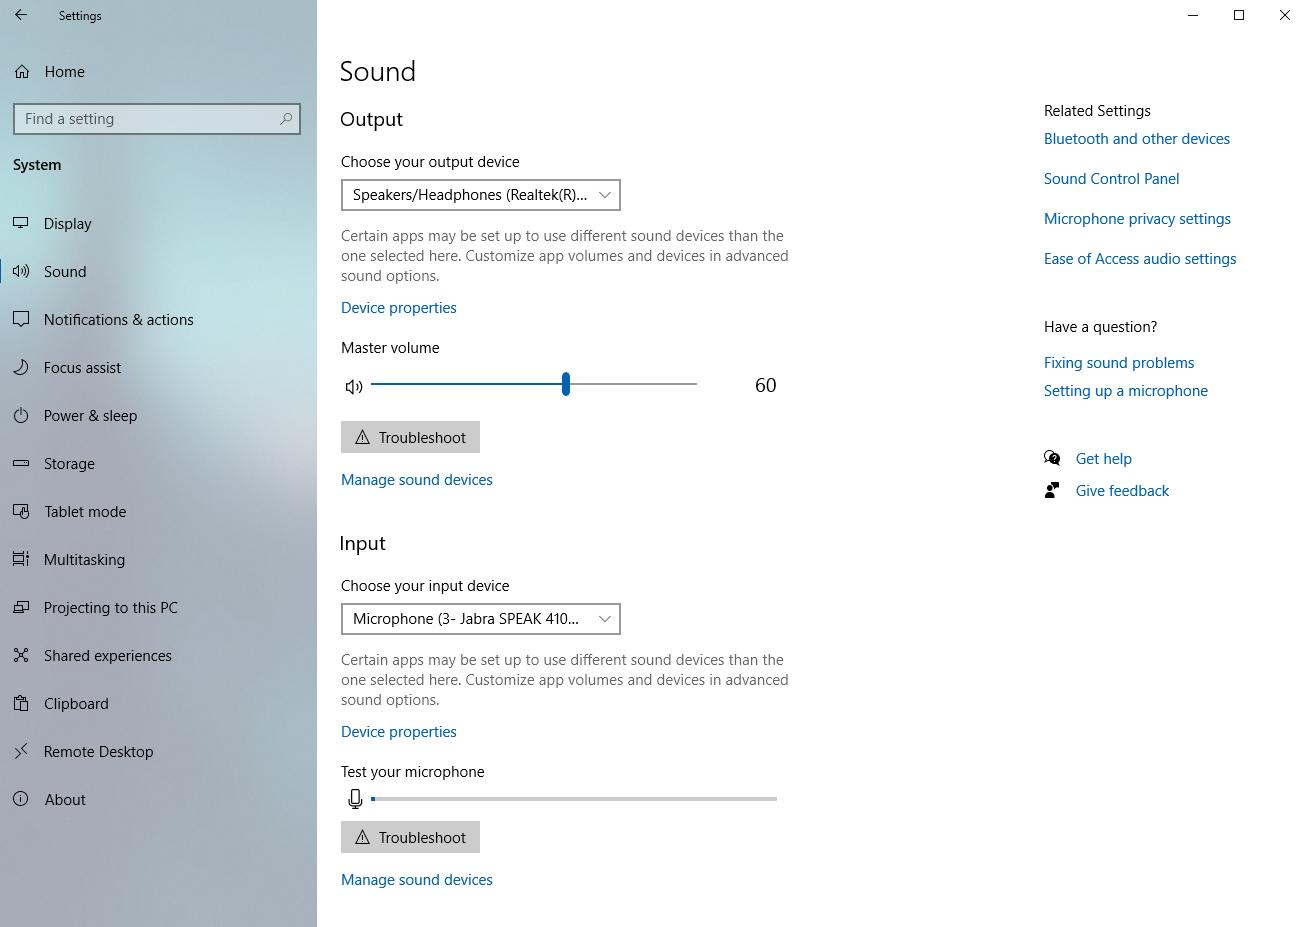 Windows 10 Sound Settings window.